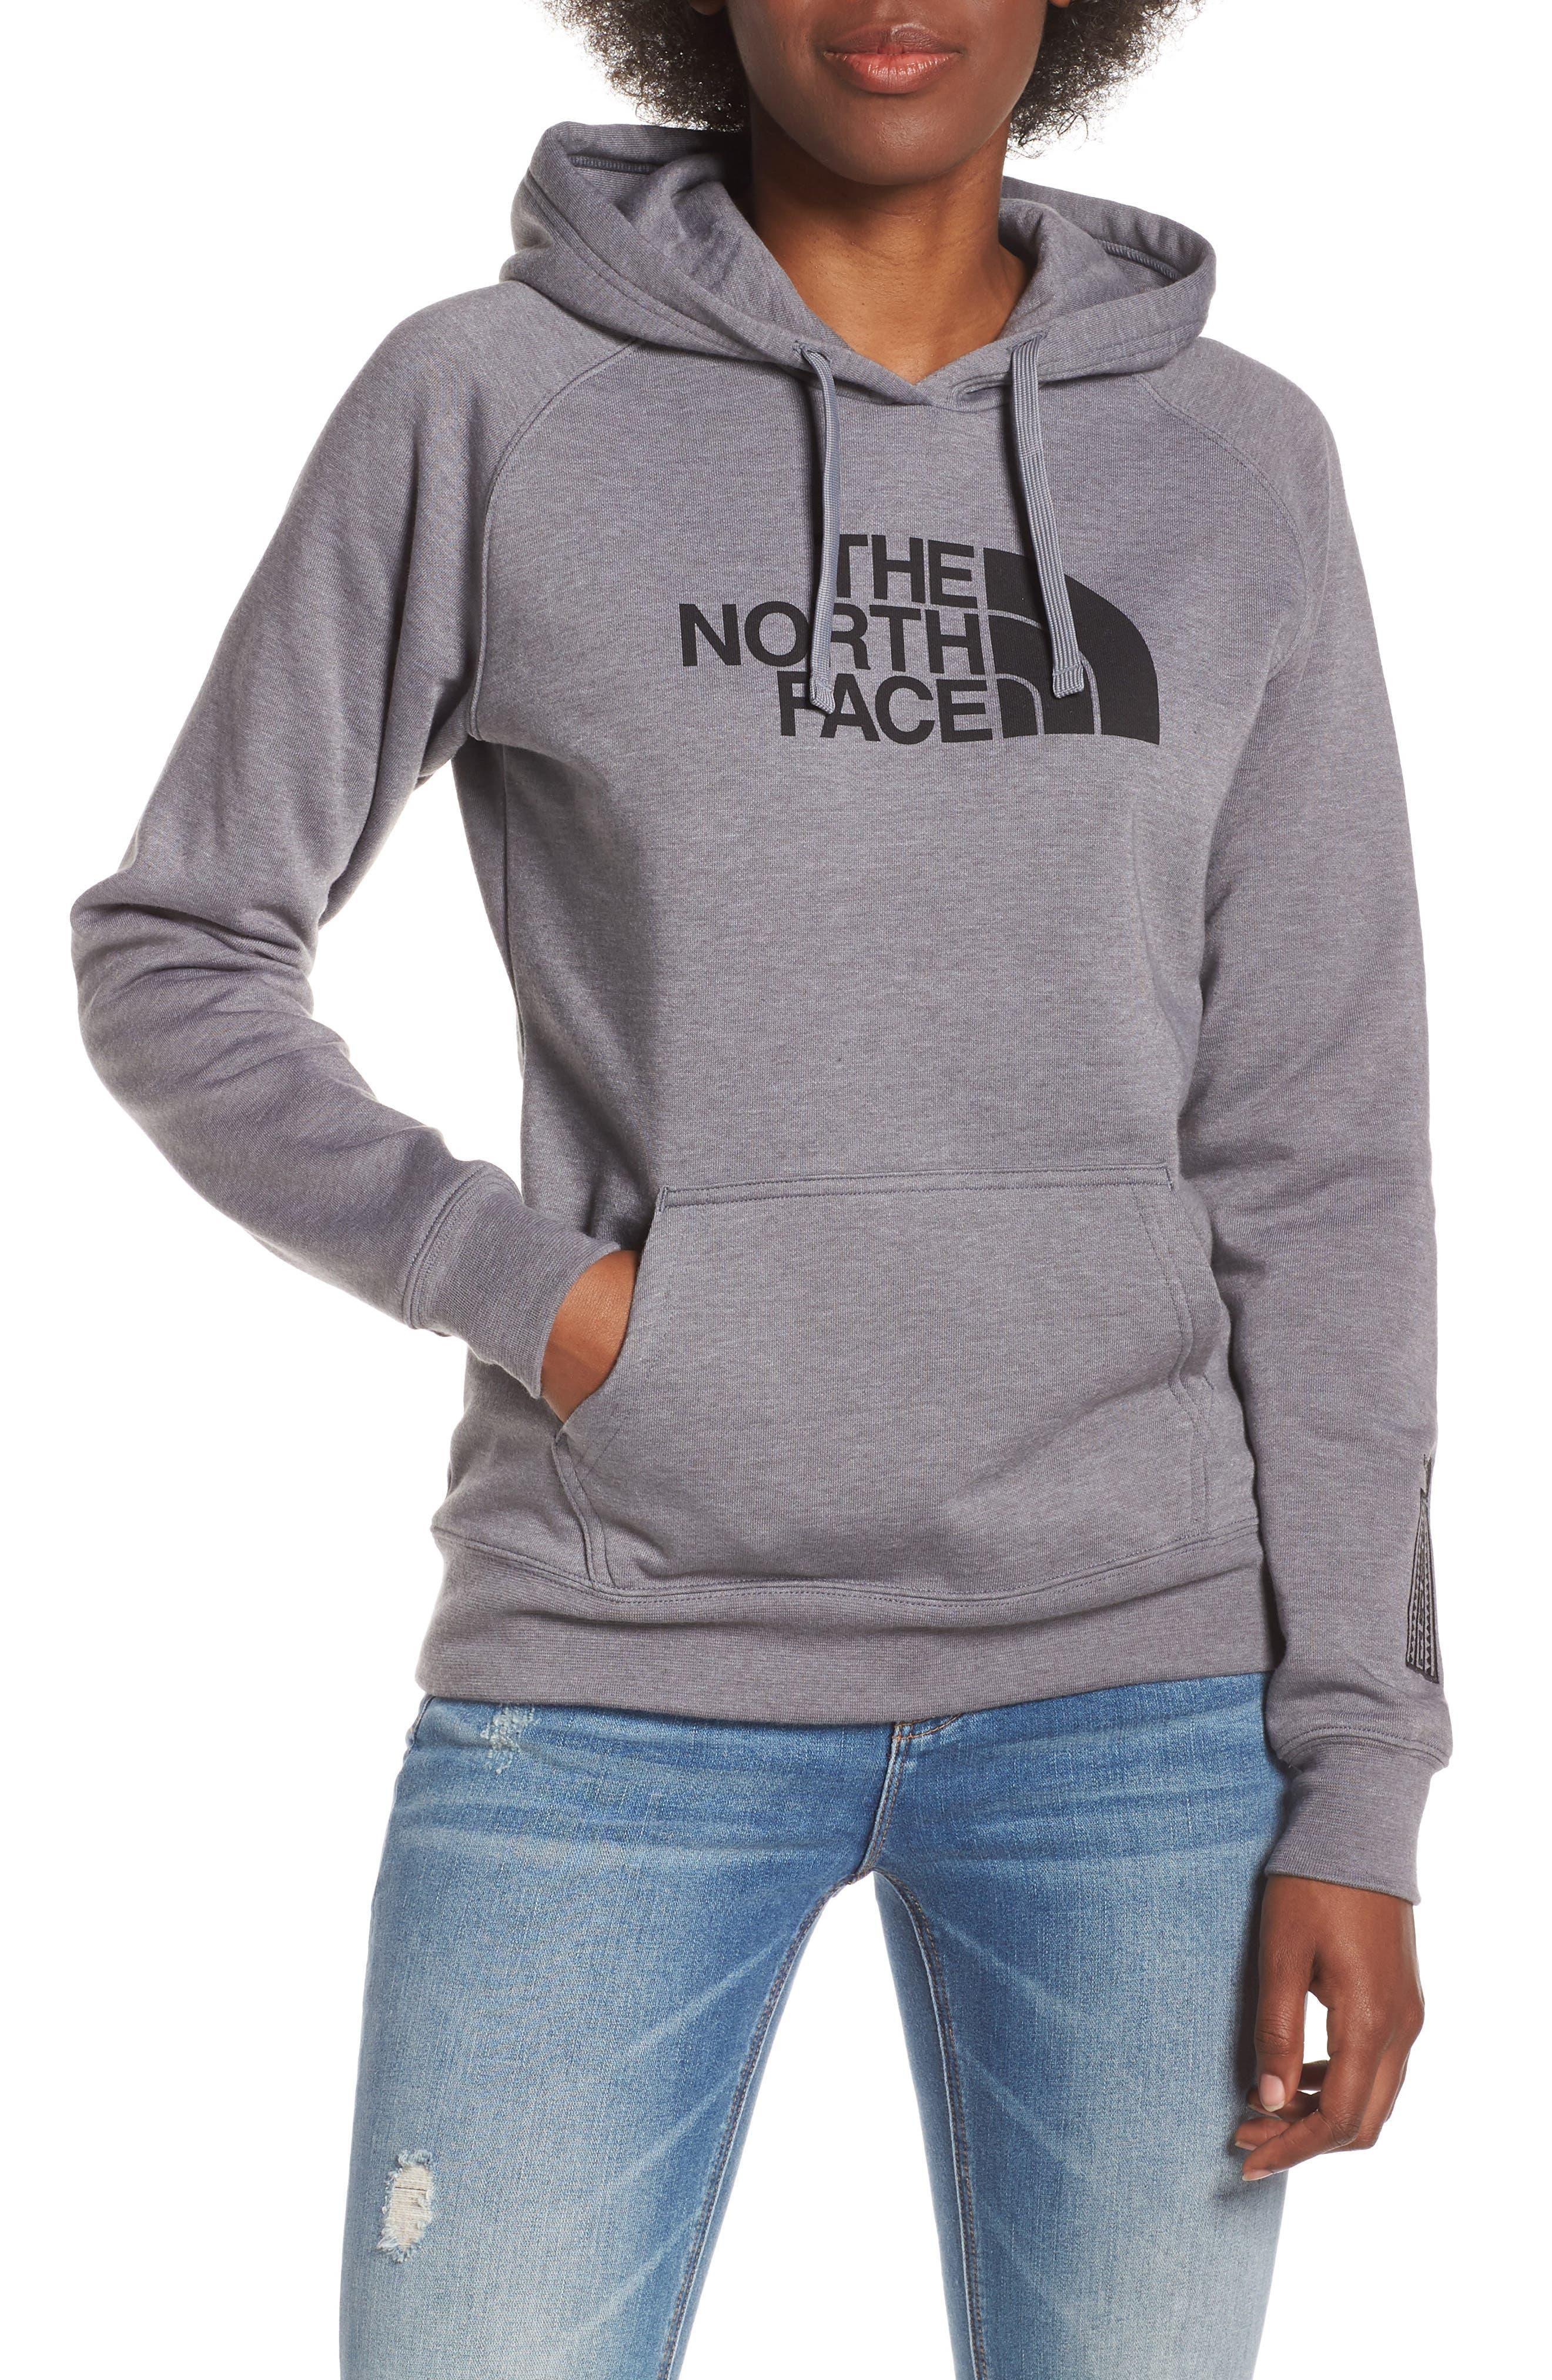 THE NORTH FACE, Half Dome Pullover, Main thumbnail 1, color, TNF GREY HEATHER/ TNF BLACK